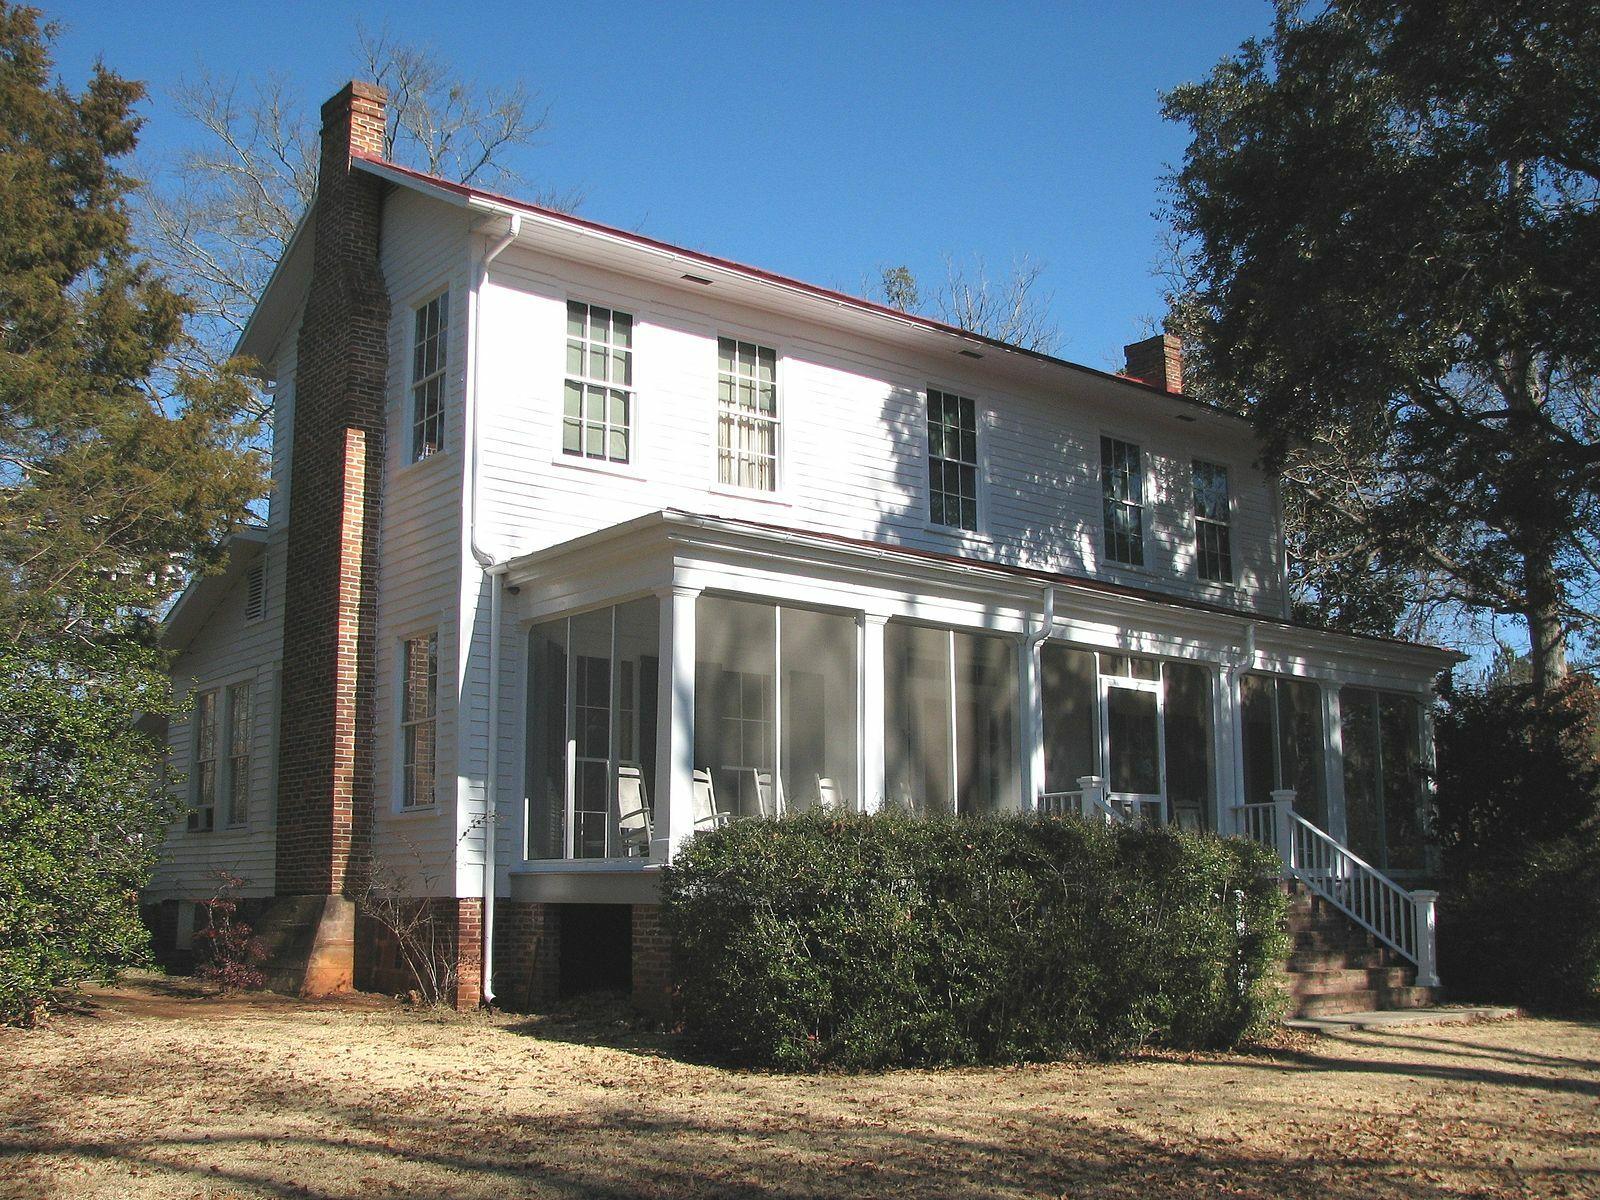 10 Fun Places Homeowners Should Visit in Georgia 5